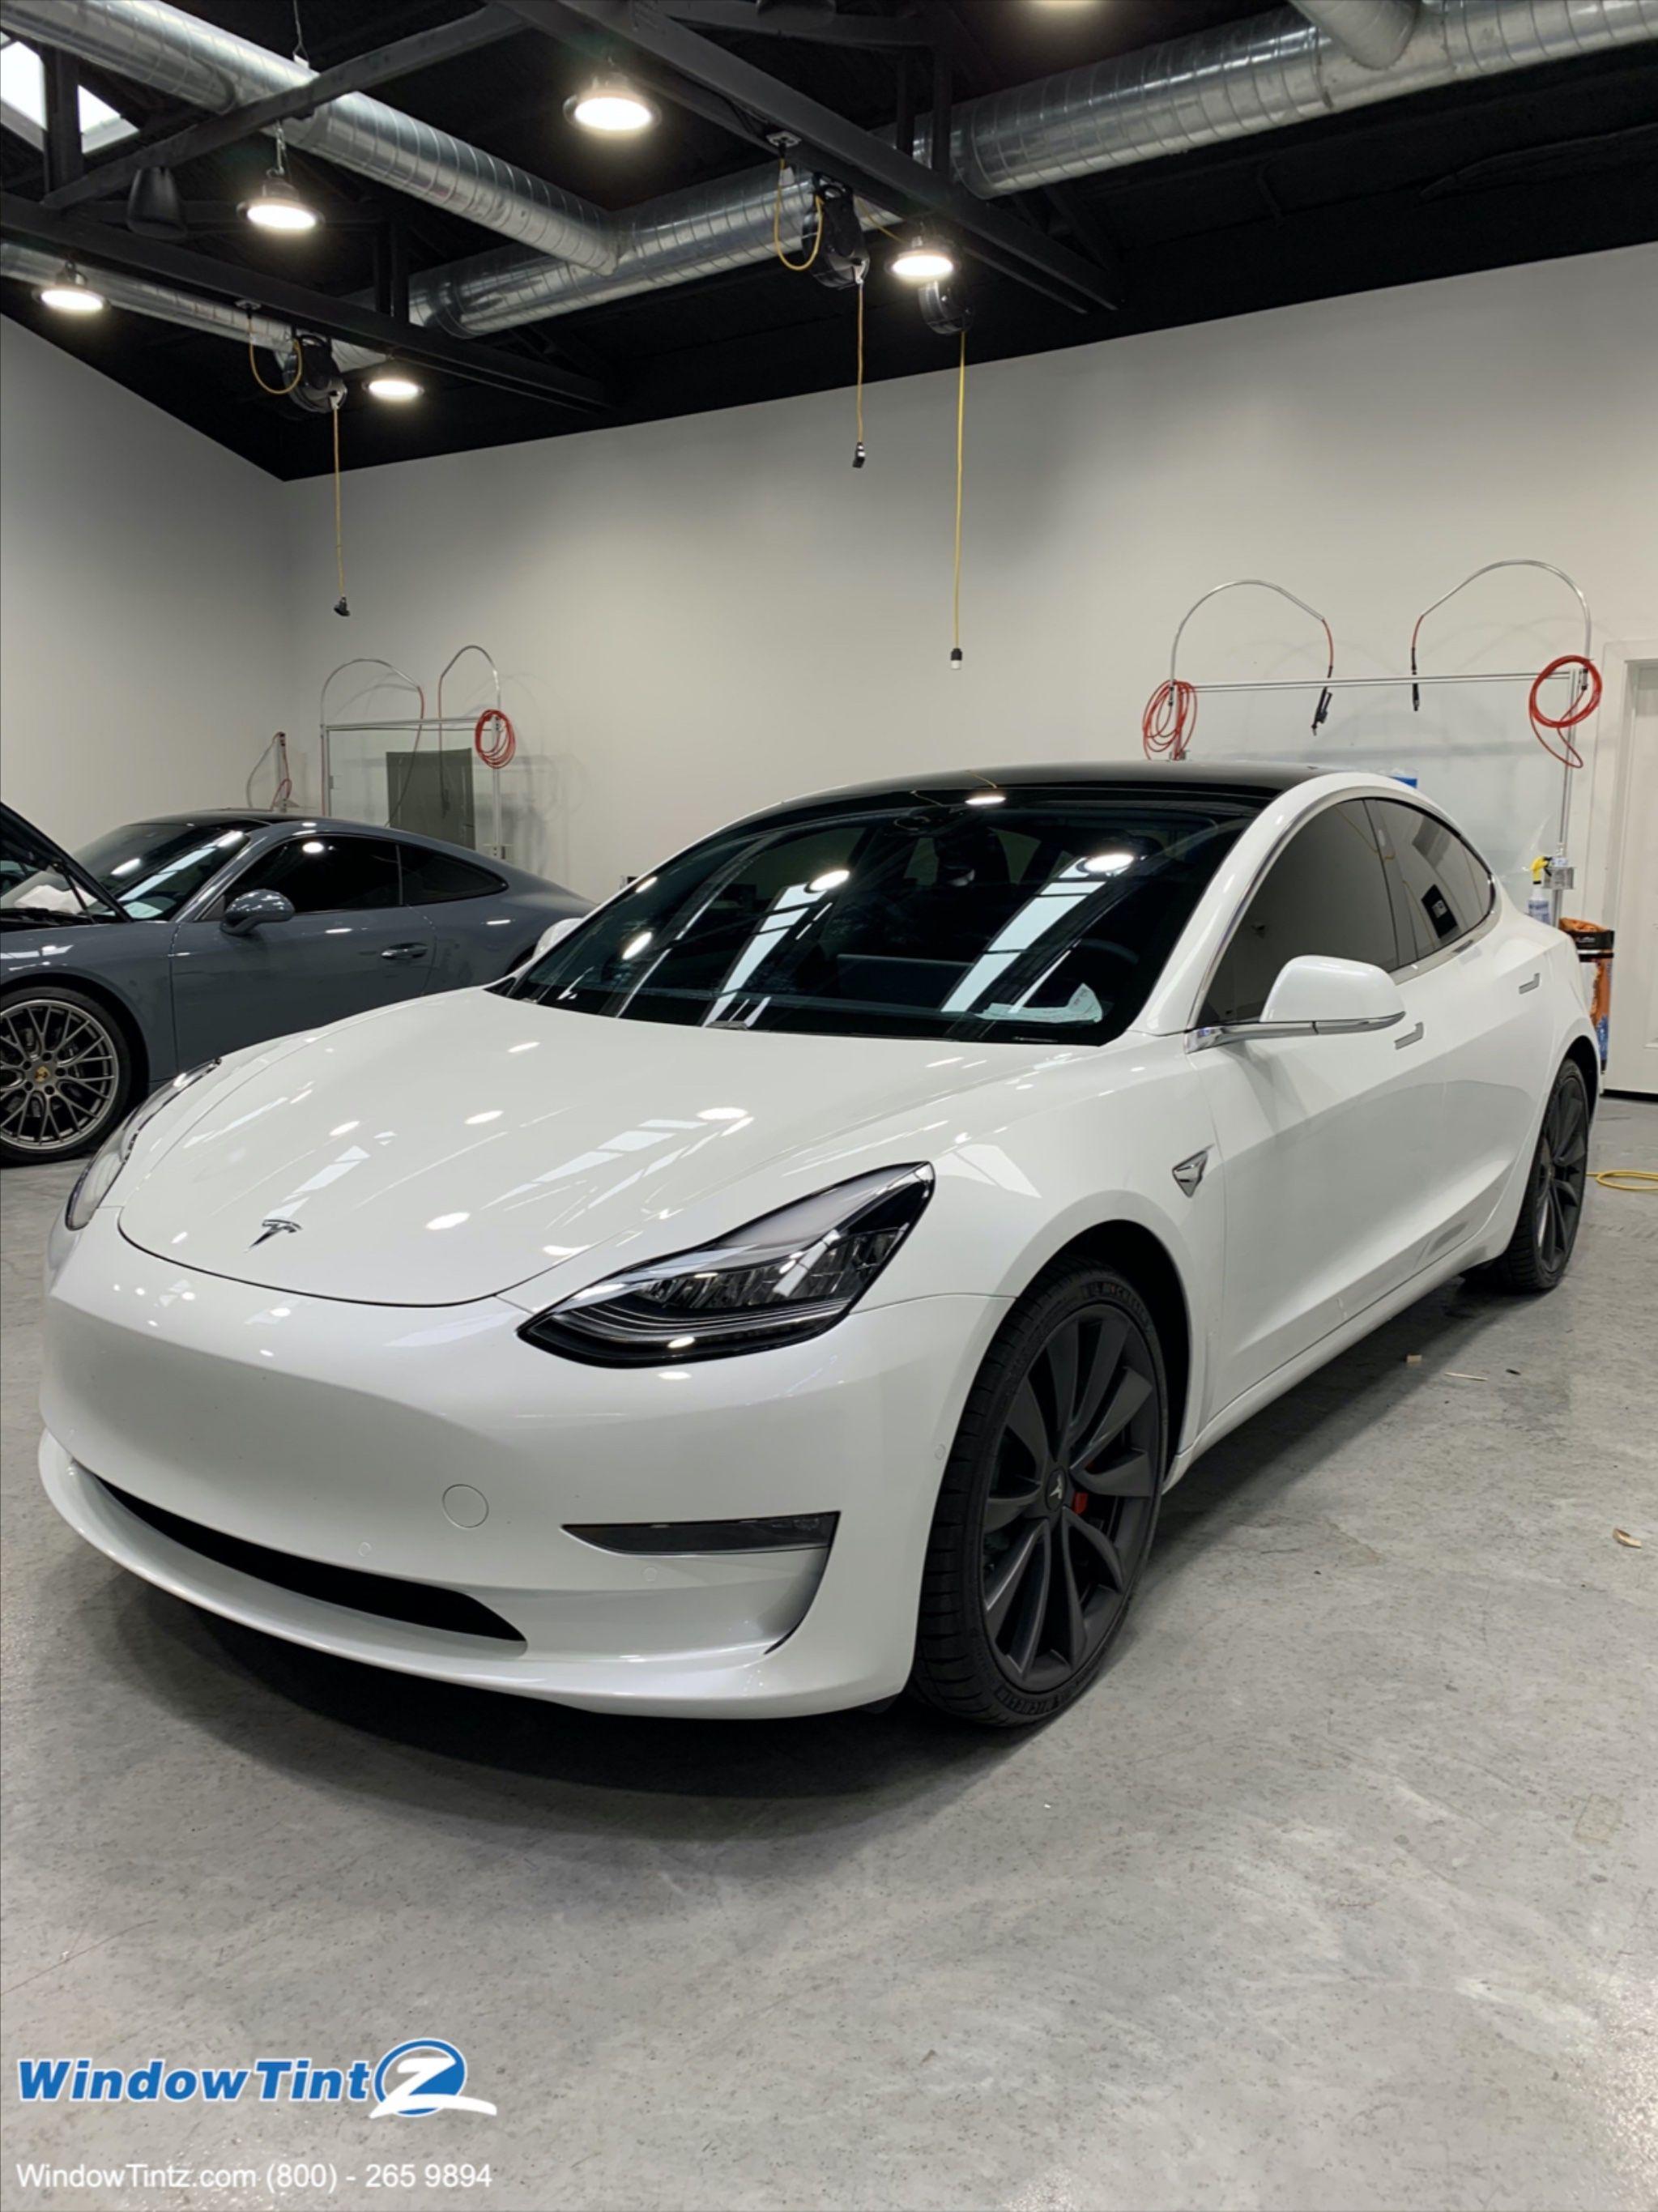 Tesla Model 3 Chrome Delete Black Out Package In 2020 Tesla Car Models Tesla Sports Car Bmw Car Models